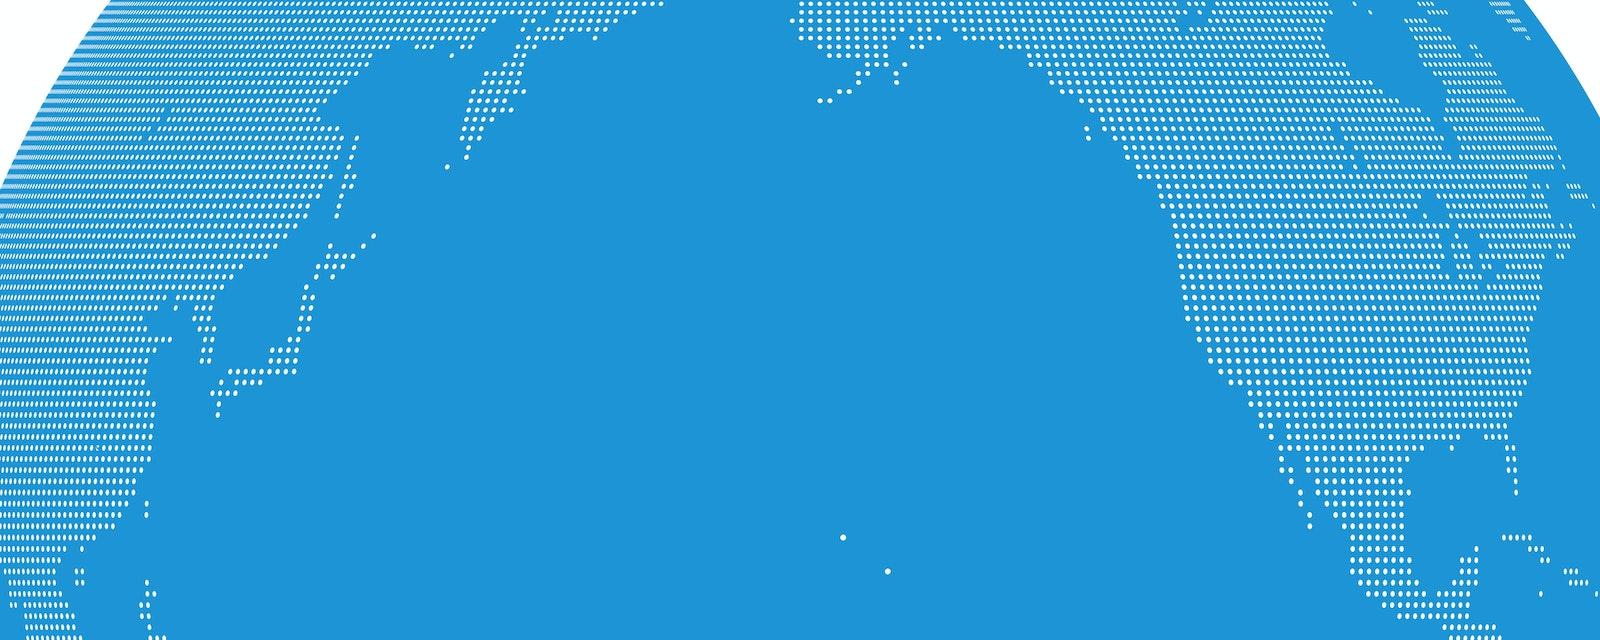 Illustration of Pacific Ocean